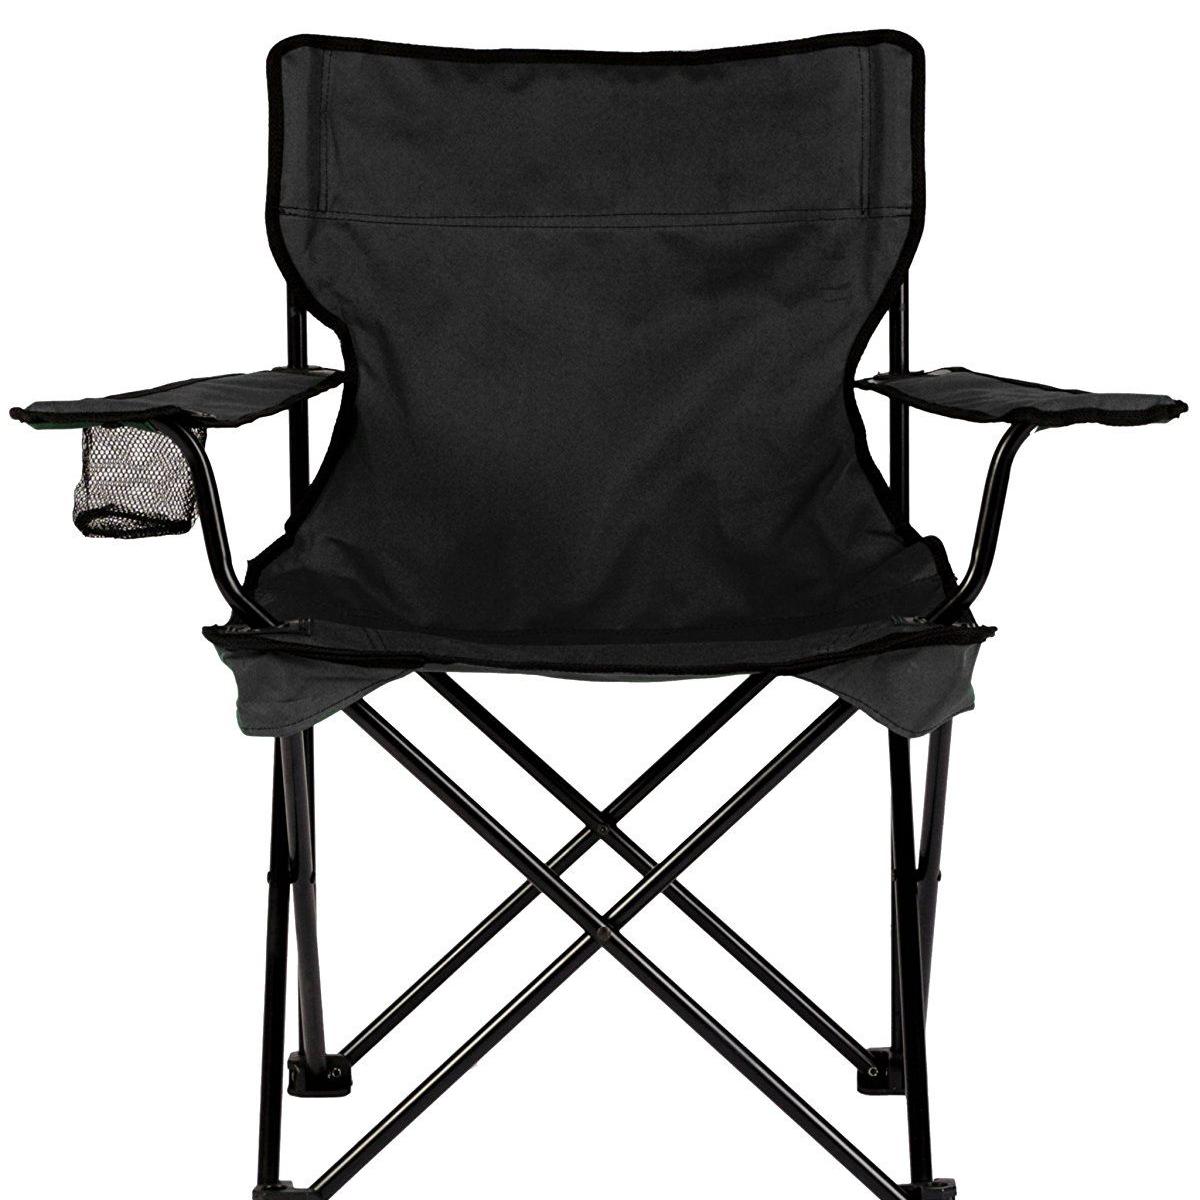 Groovy Black Camping Chair Camellatalisay Diy Chair Ideas Camellatalisaycom